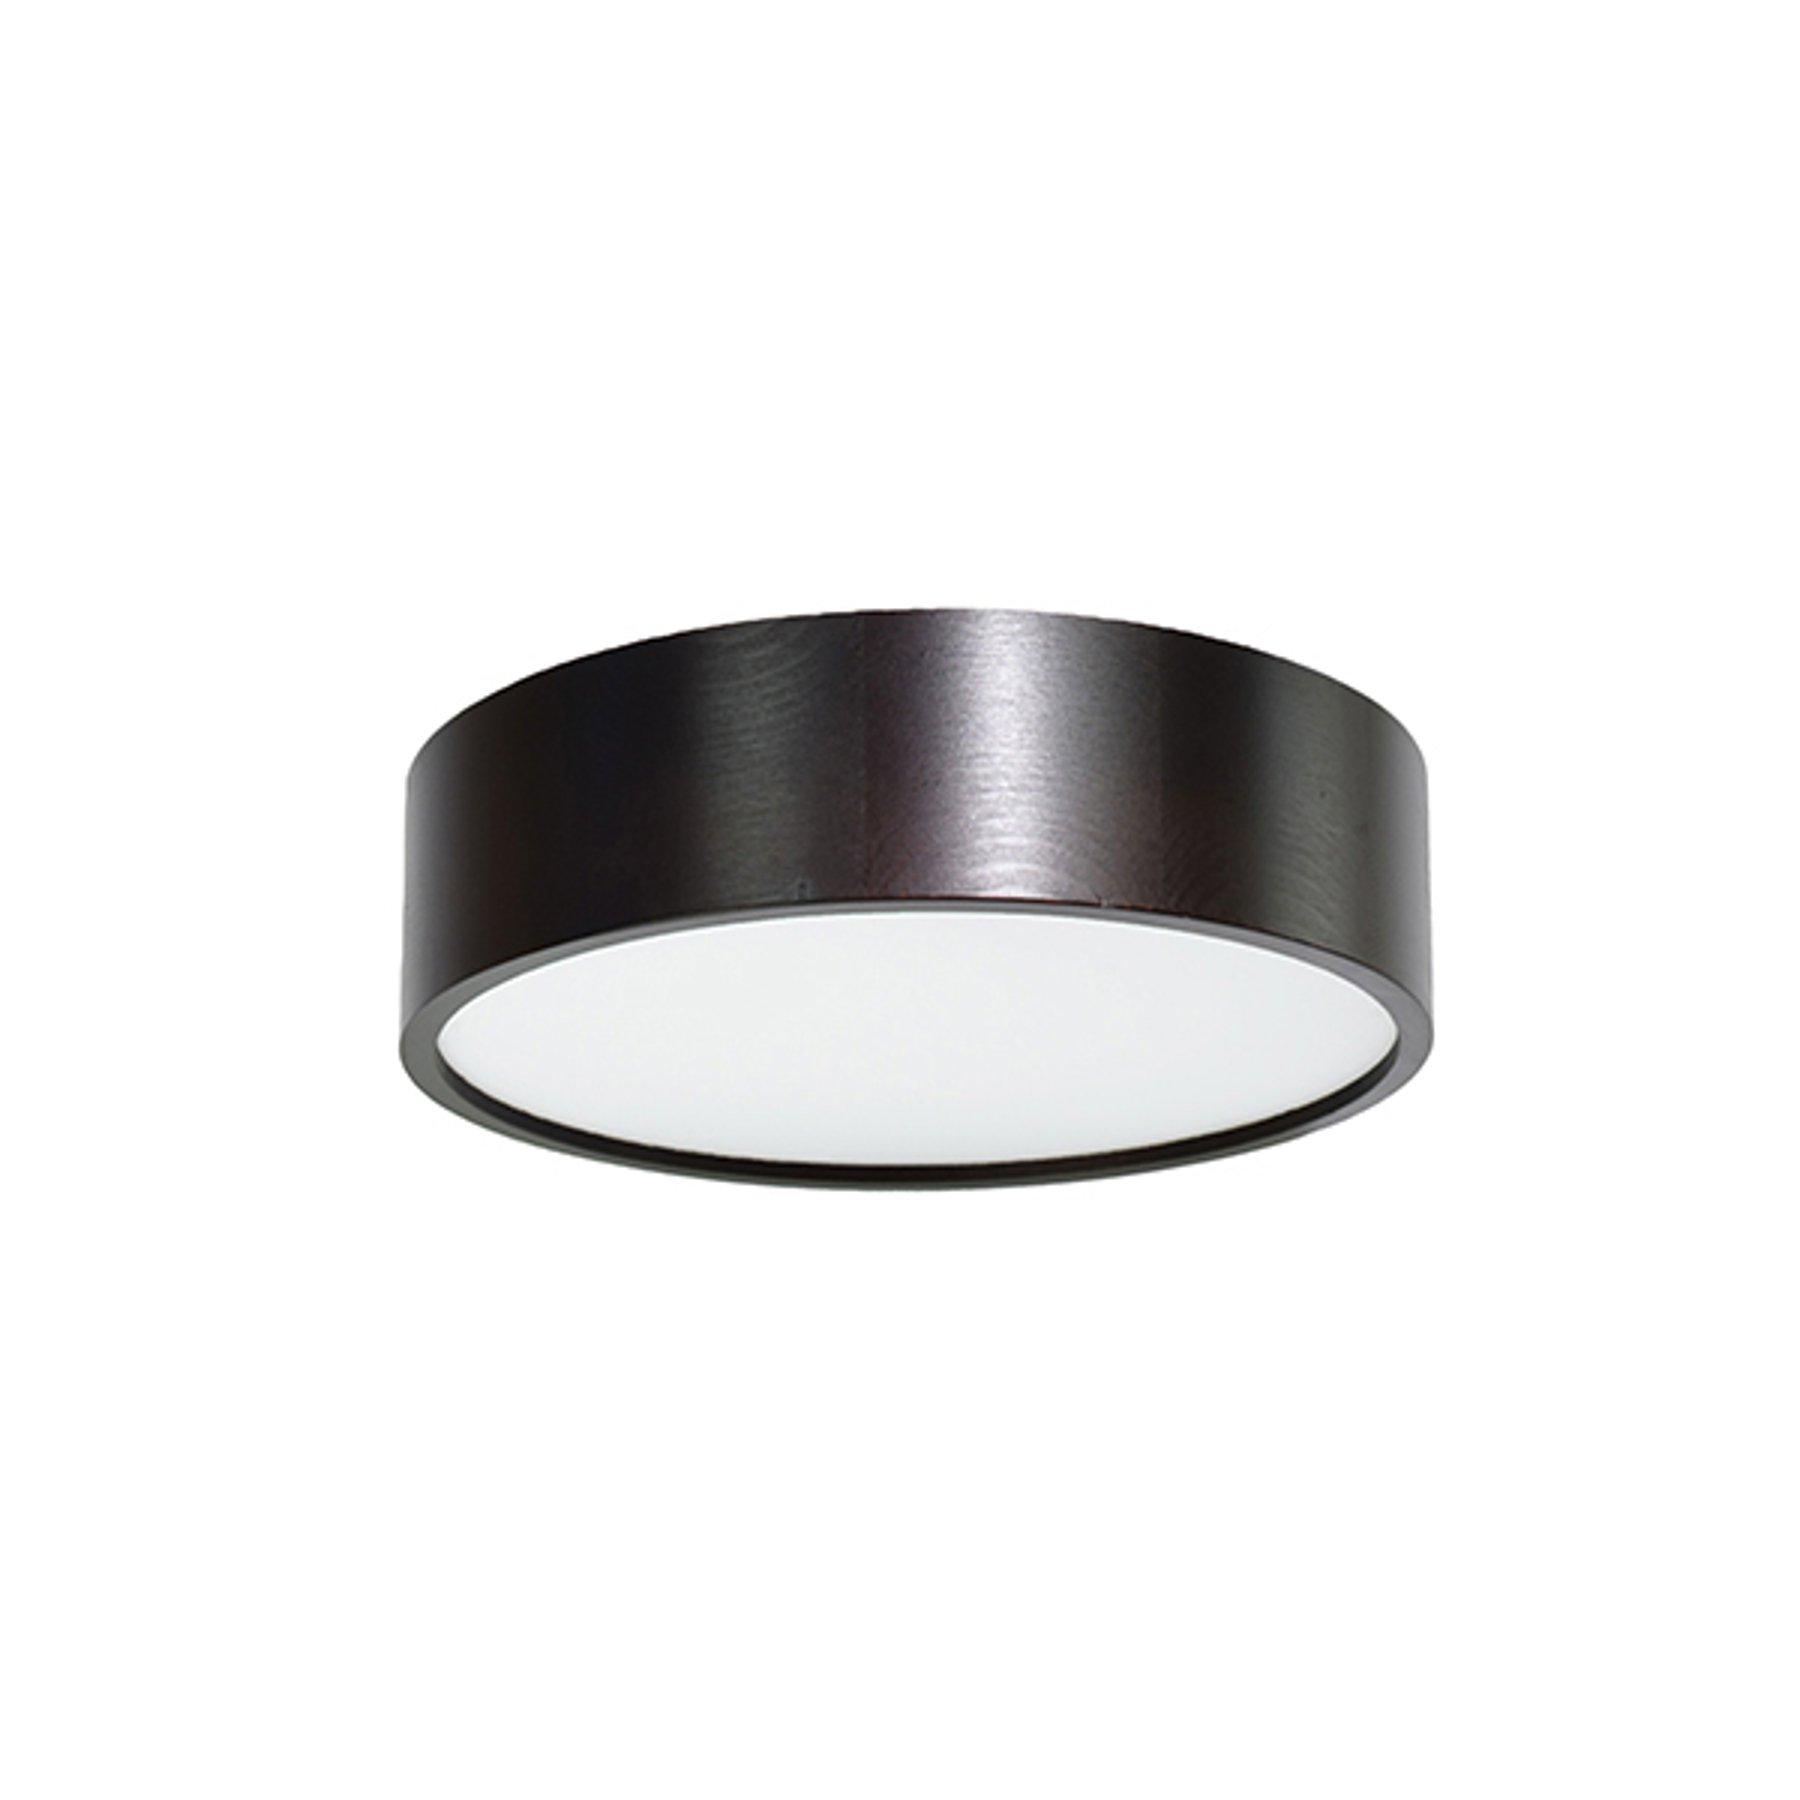 LED-taklampe Cleo, Ø 28 cm svart